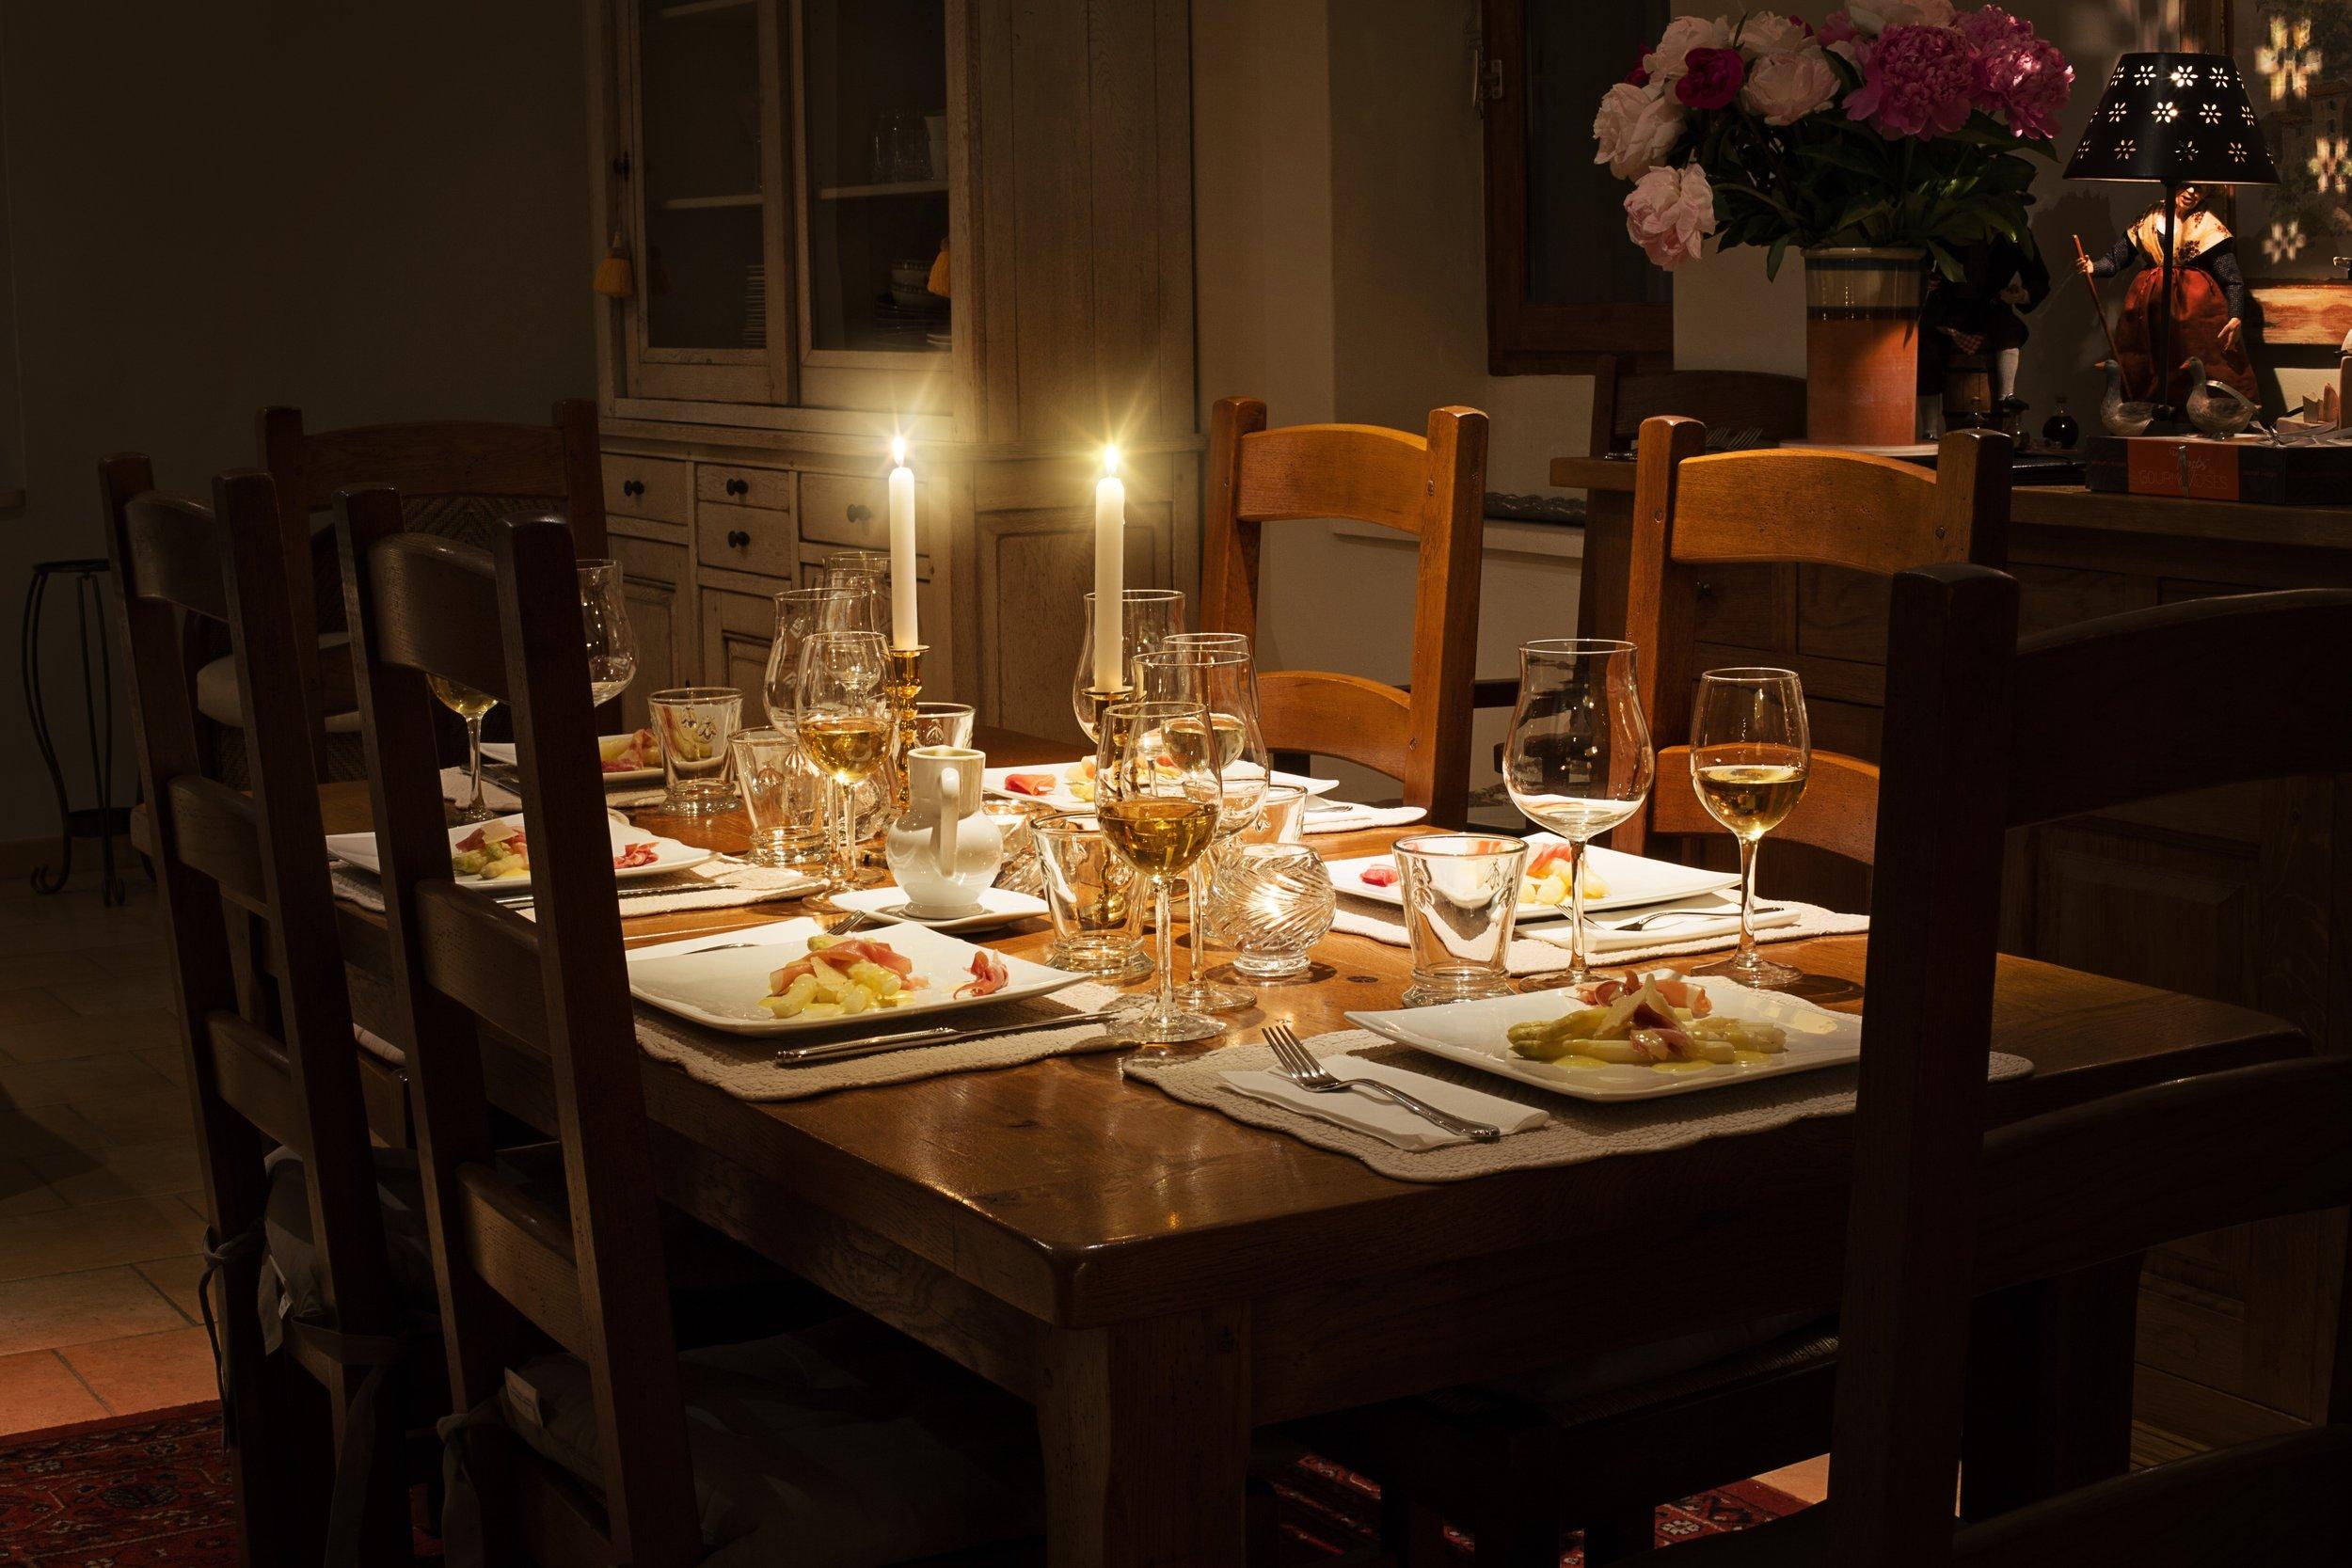 candles-celebration-cutlery-262882.jpg